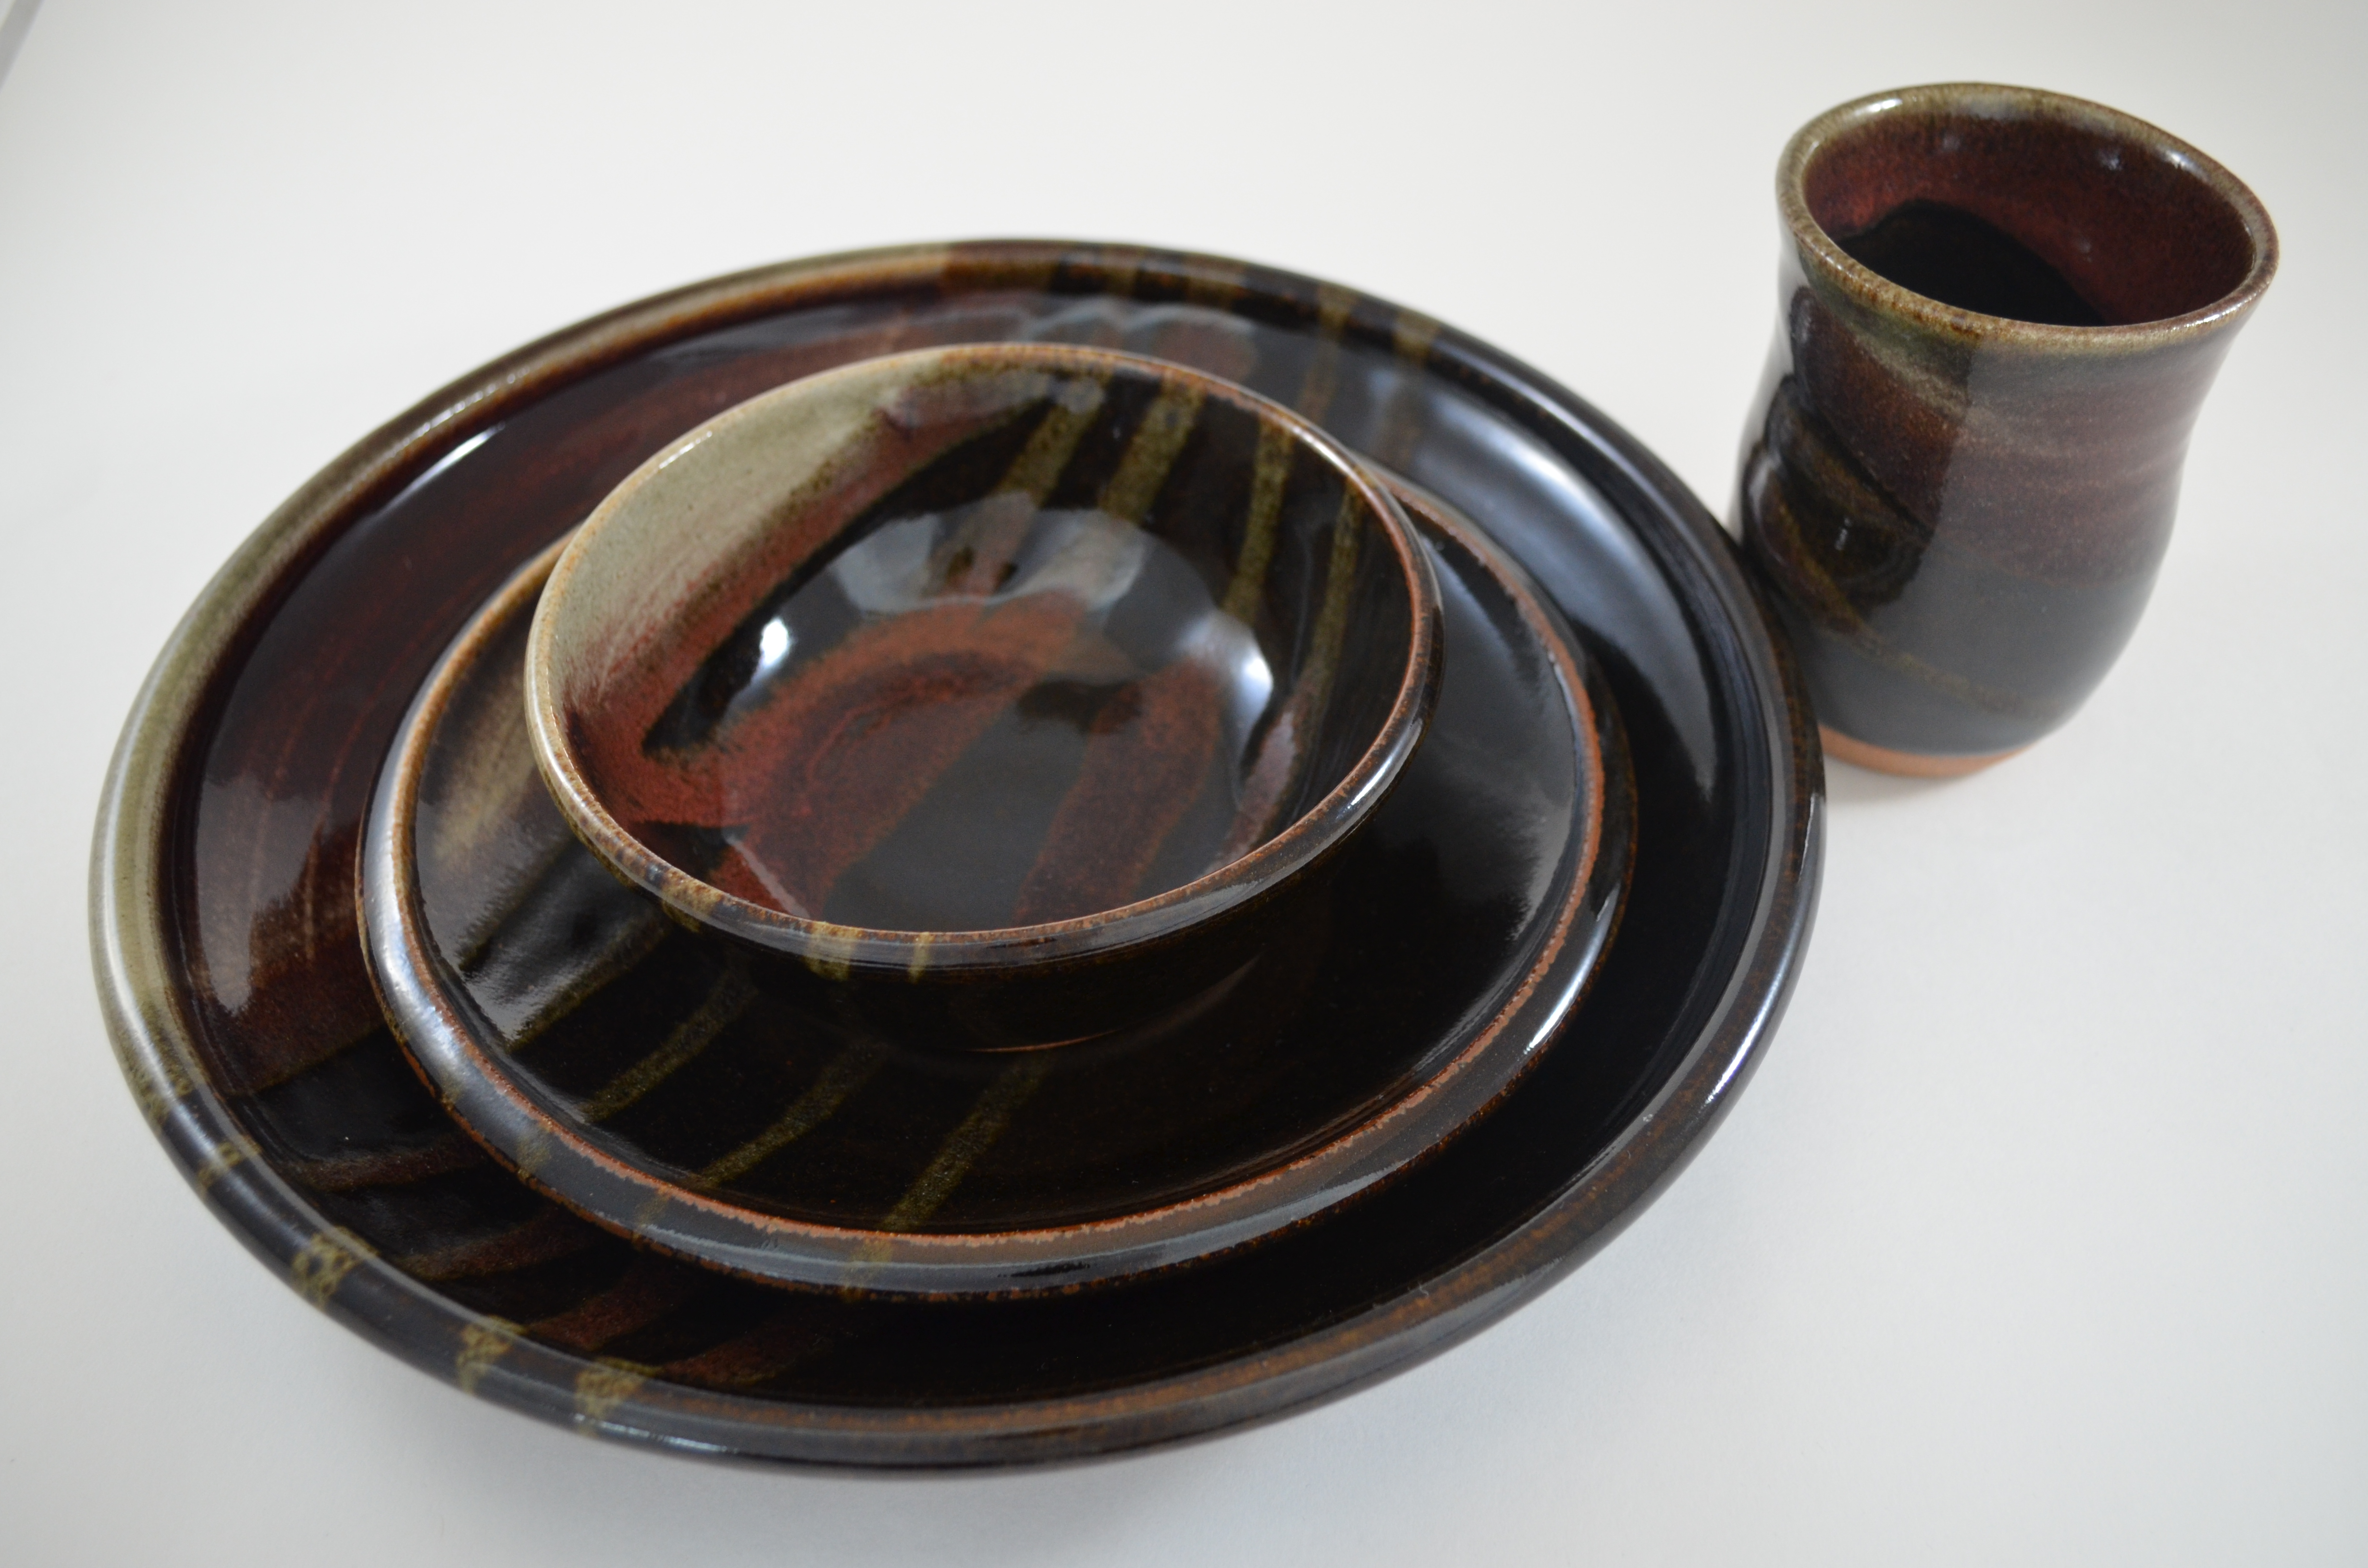 Set of dinnerware, pottery by Kylie Rieke